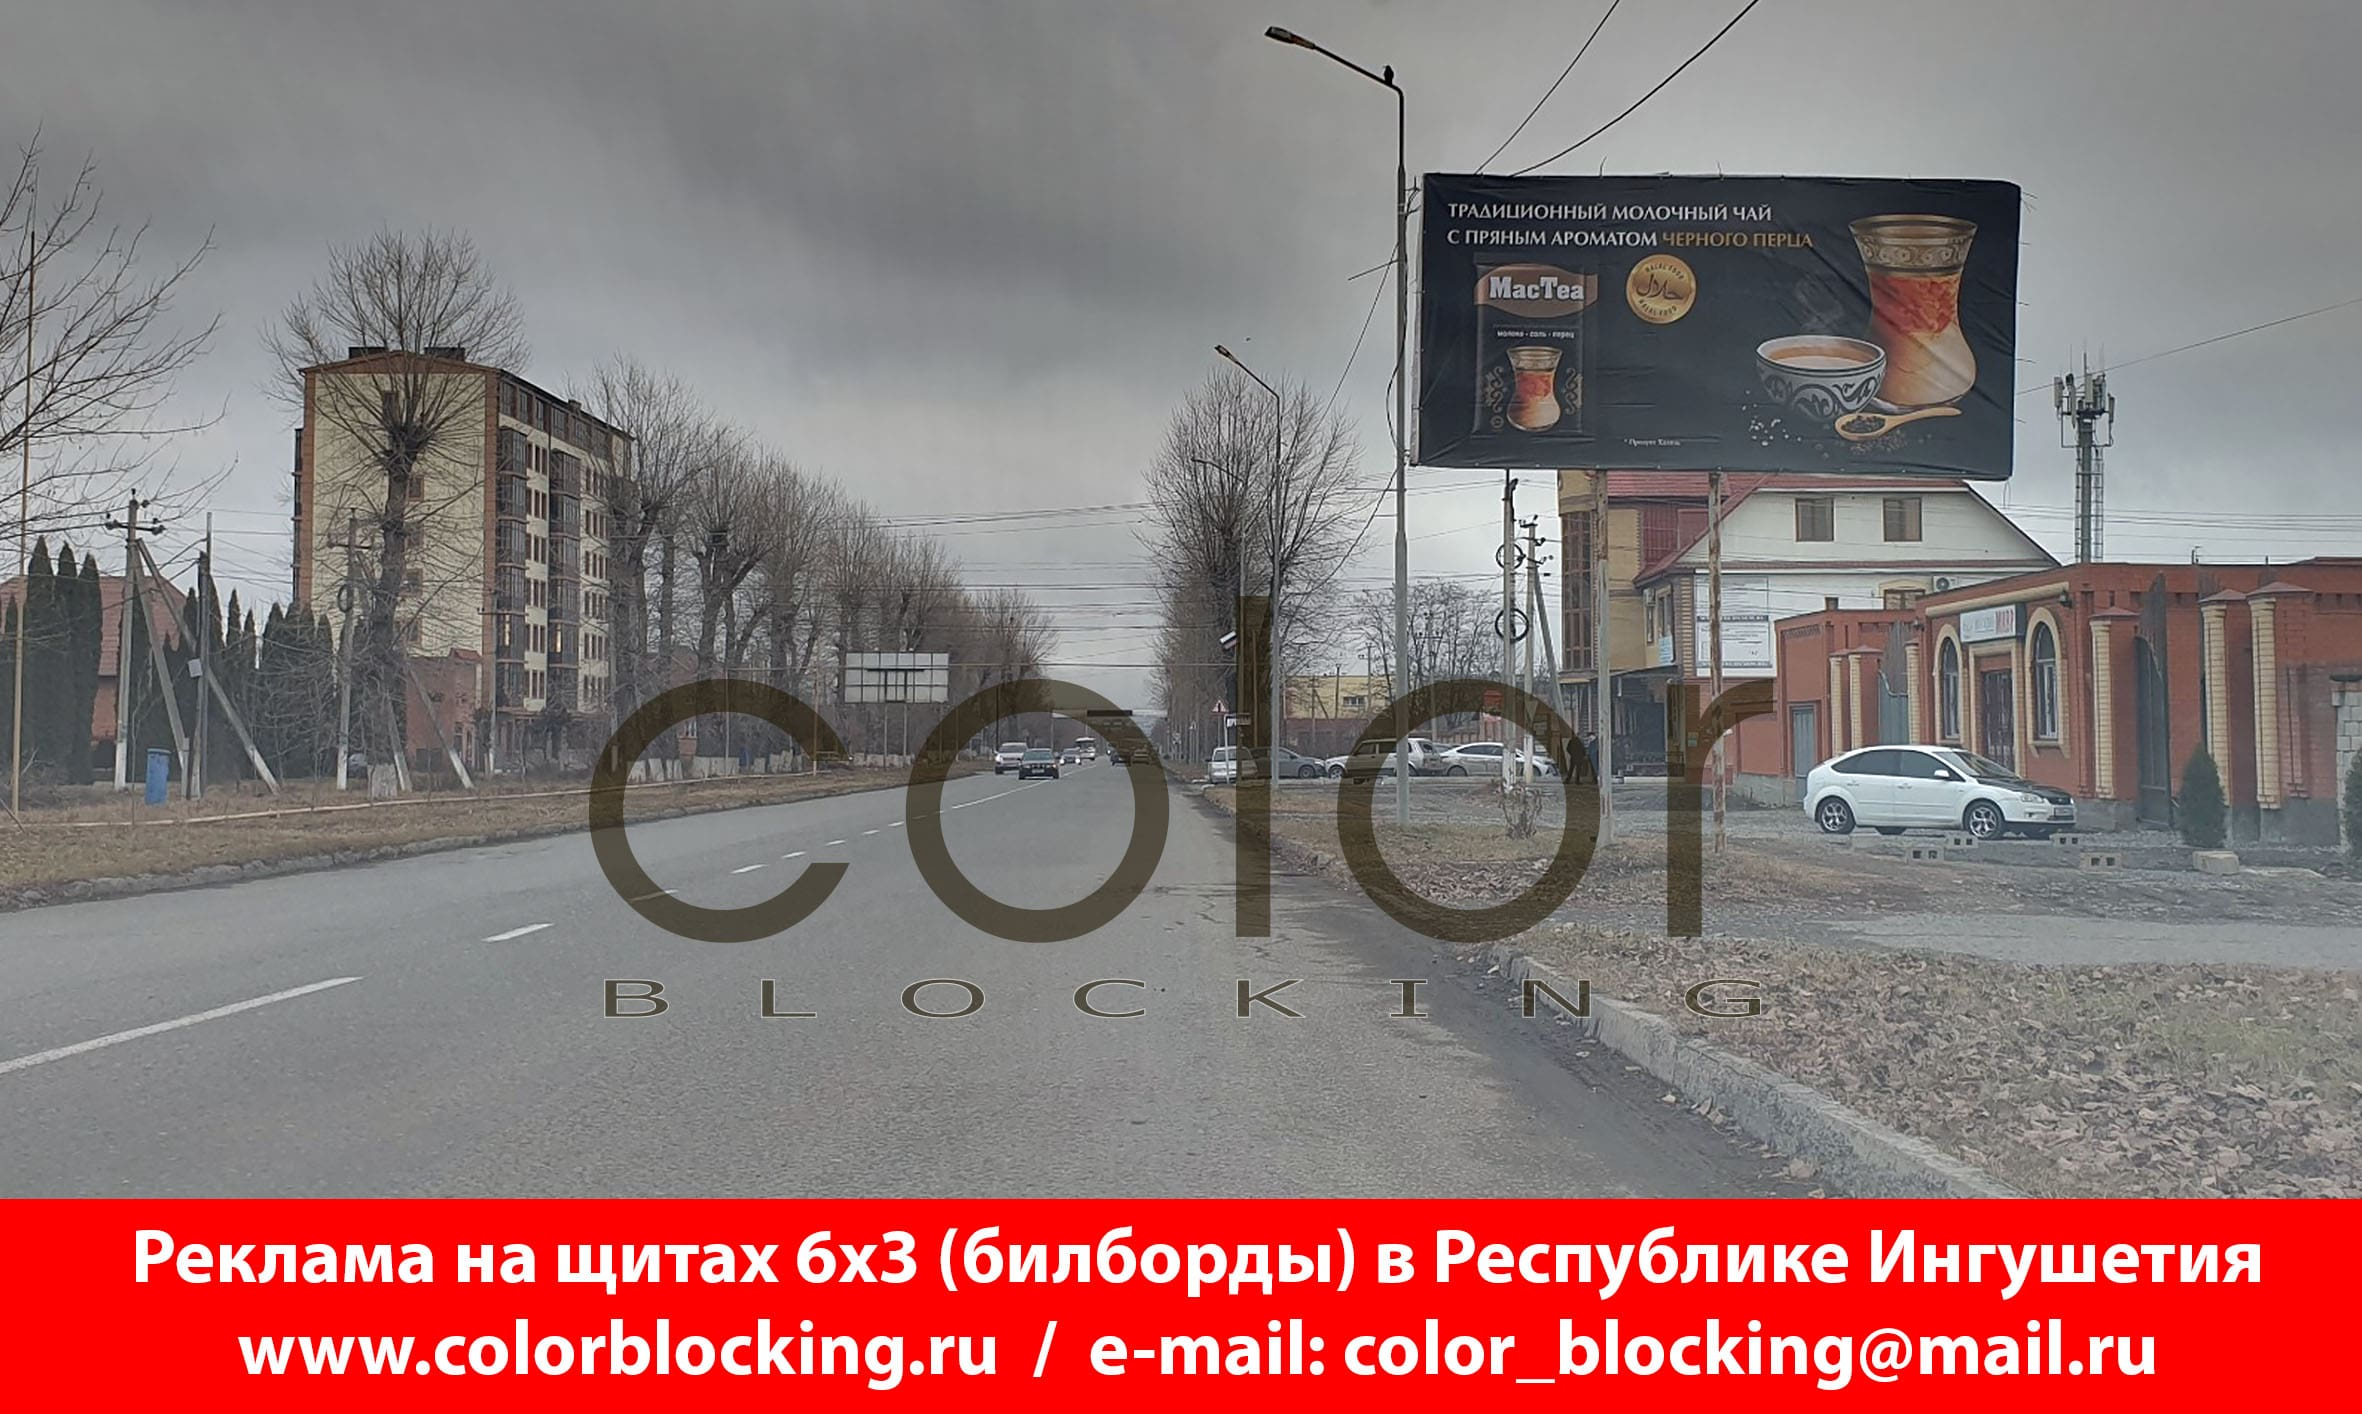 Реклама в Ингушетии на щитах 6х3 Муталиева